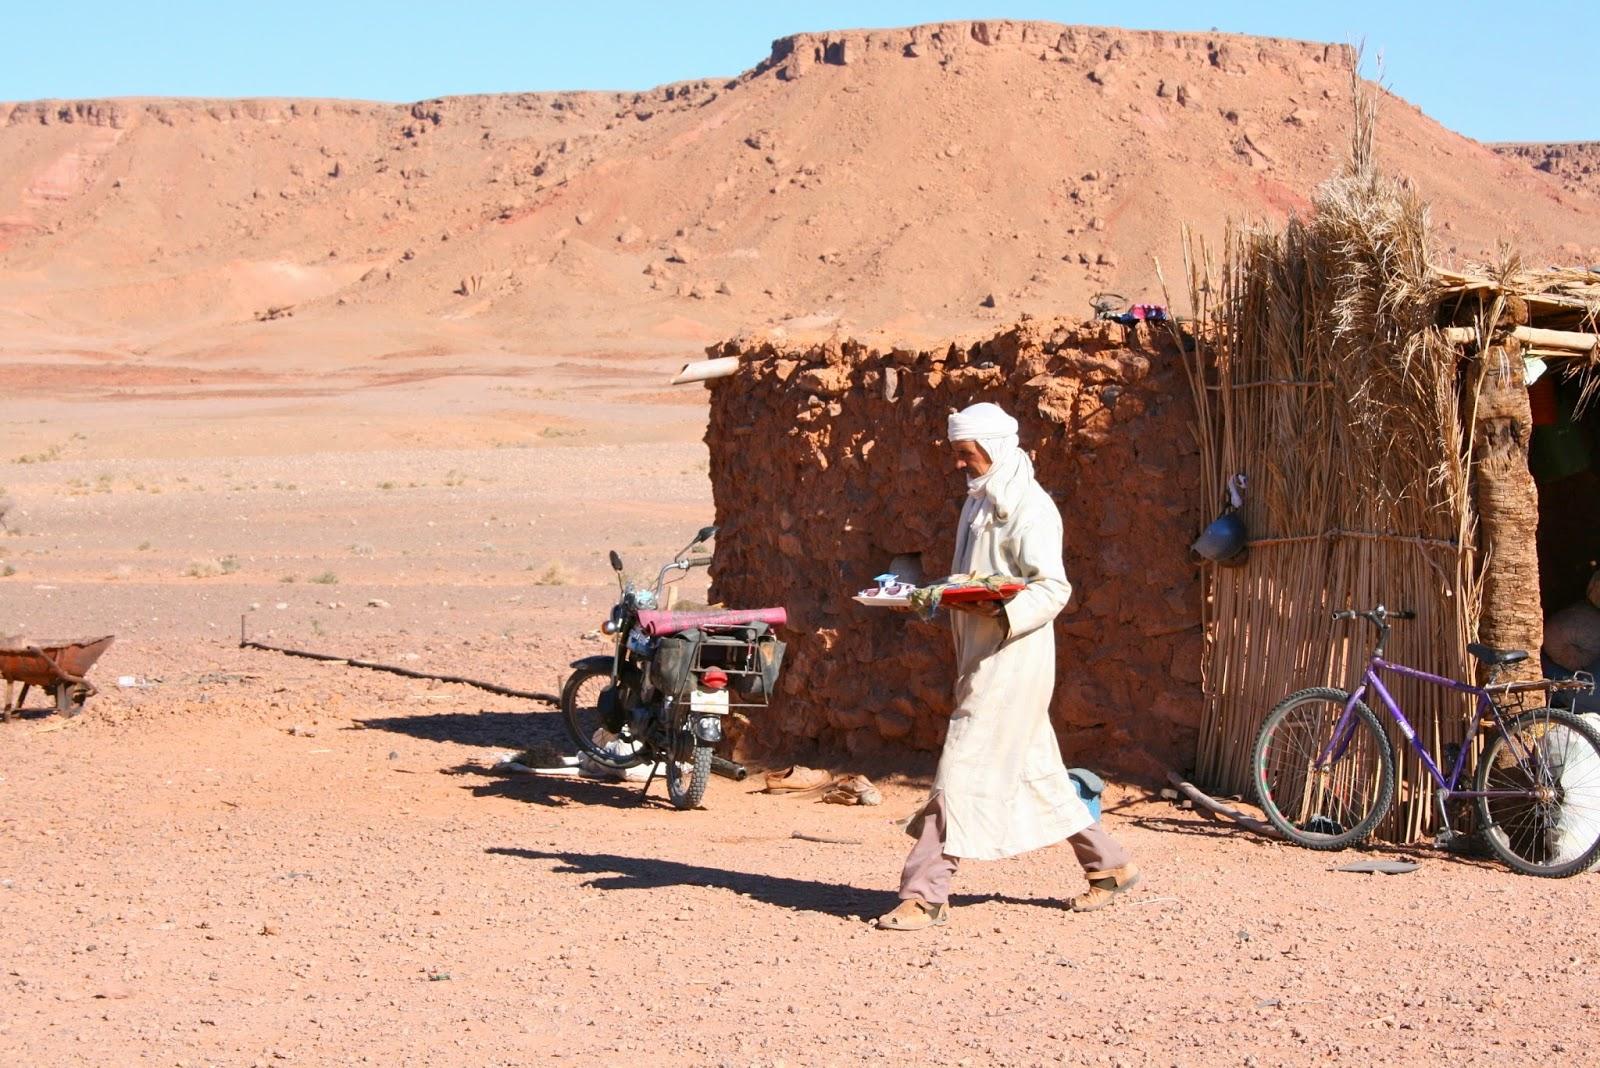 marruecos, aventura, alojamientos, vivir el desierto, arfoud, merzouga, marrakech